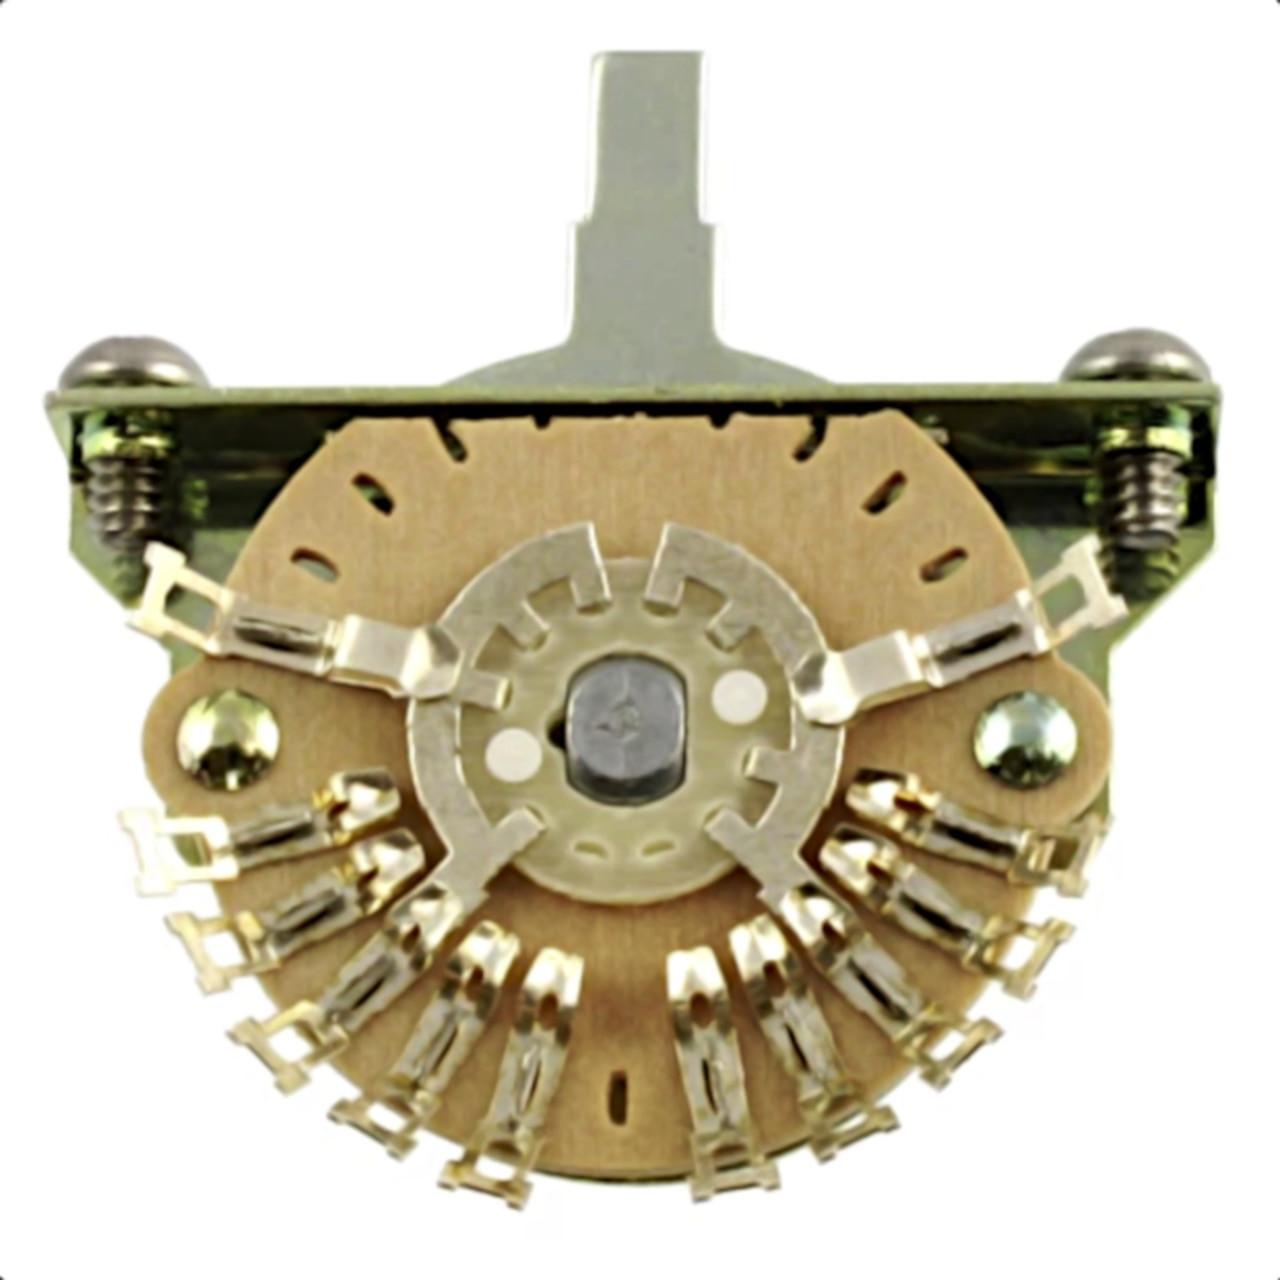 Oak Grigsby - 5-way Selector Switch - 2 Pole